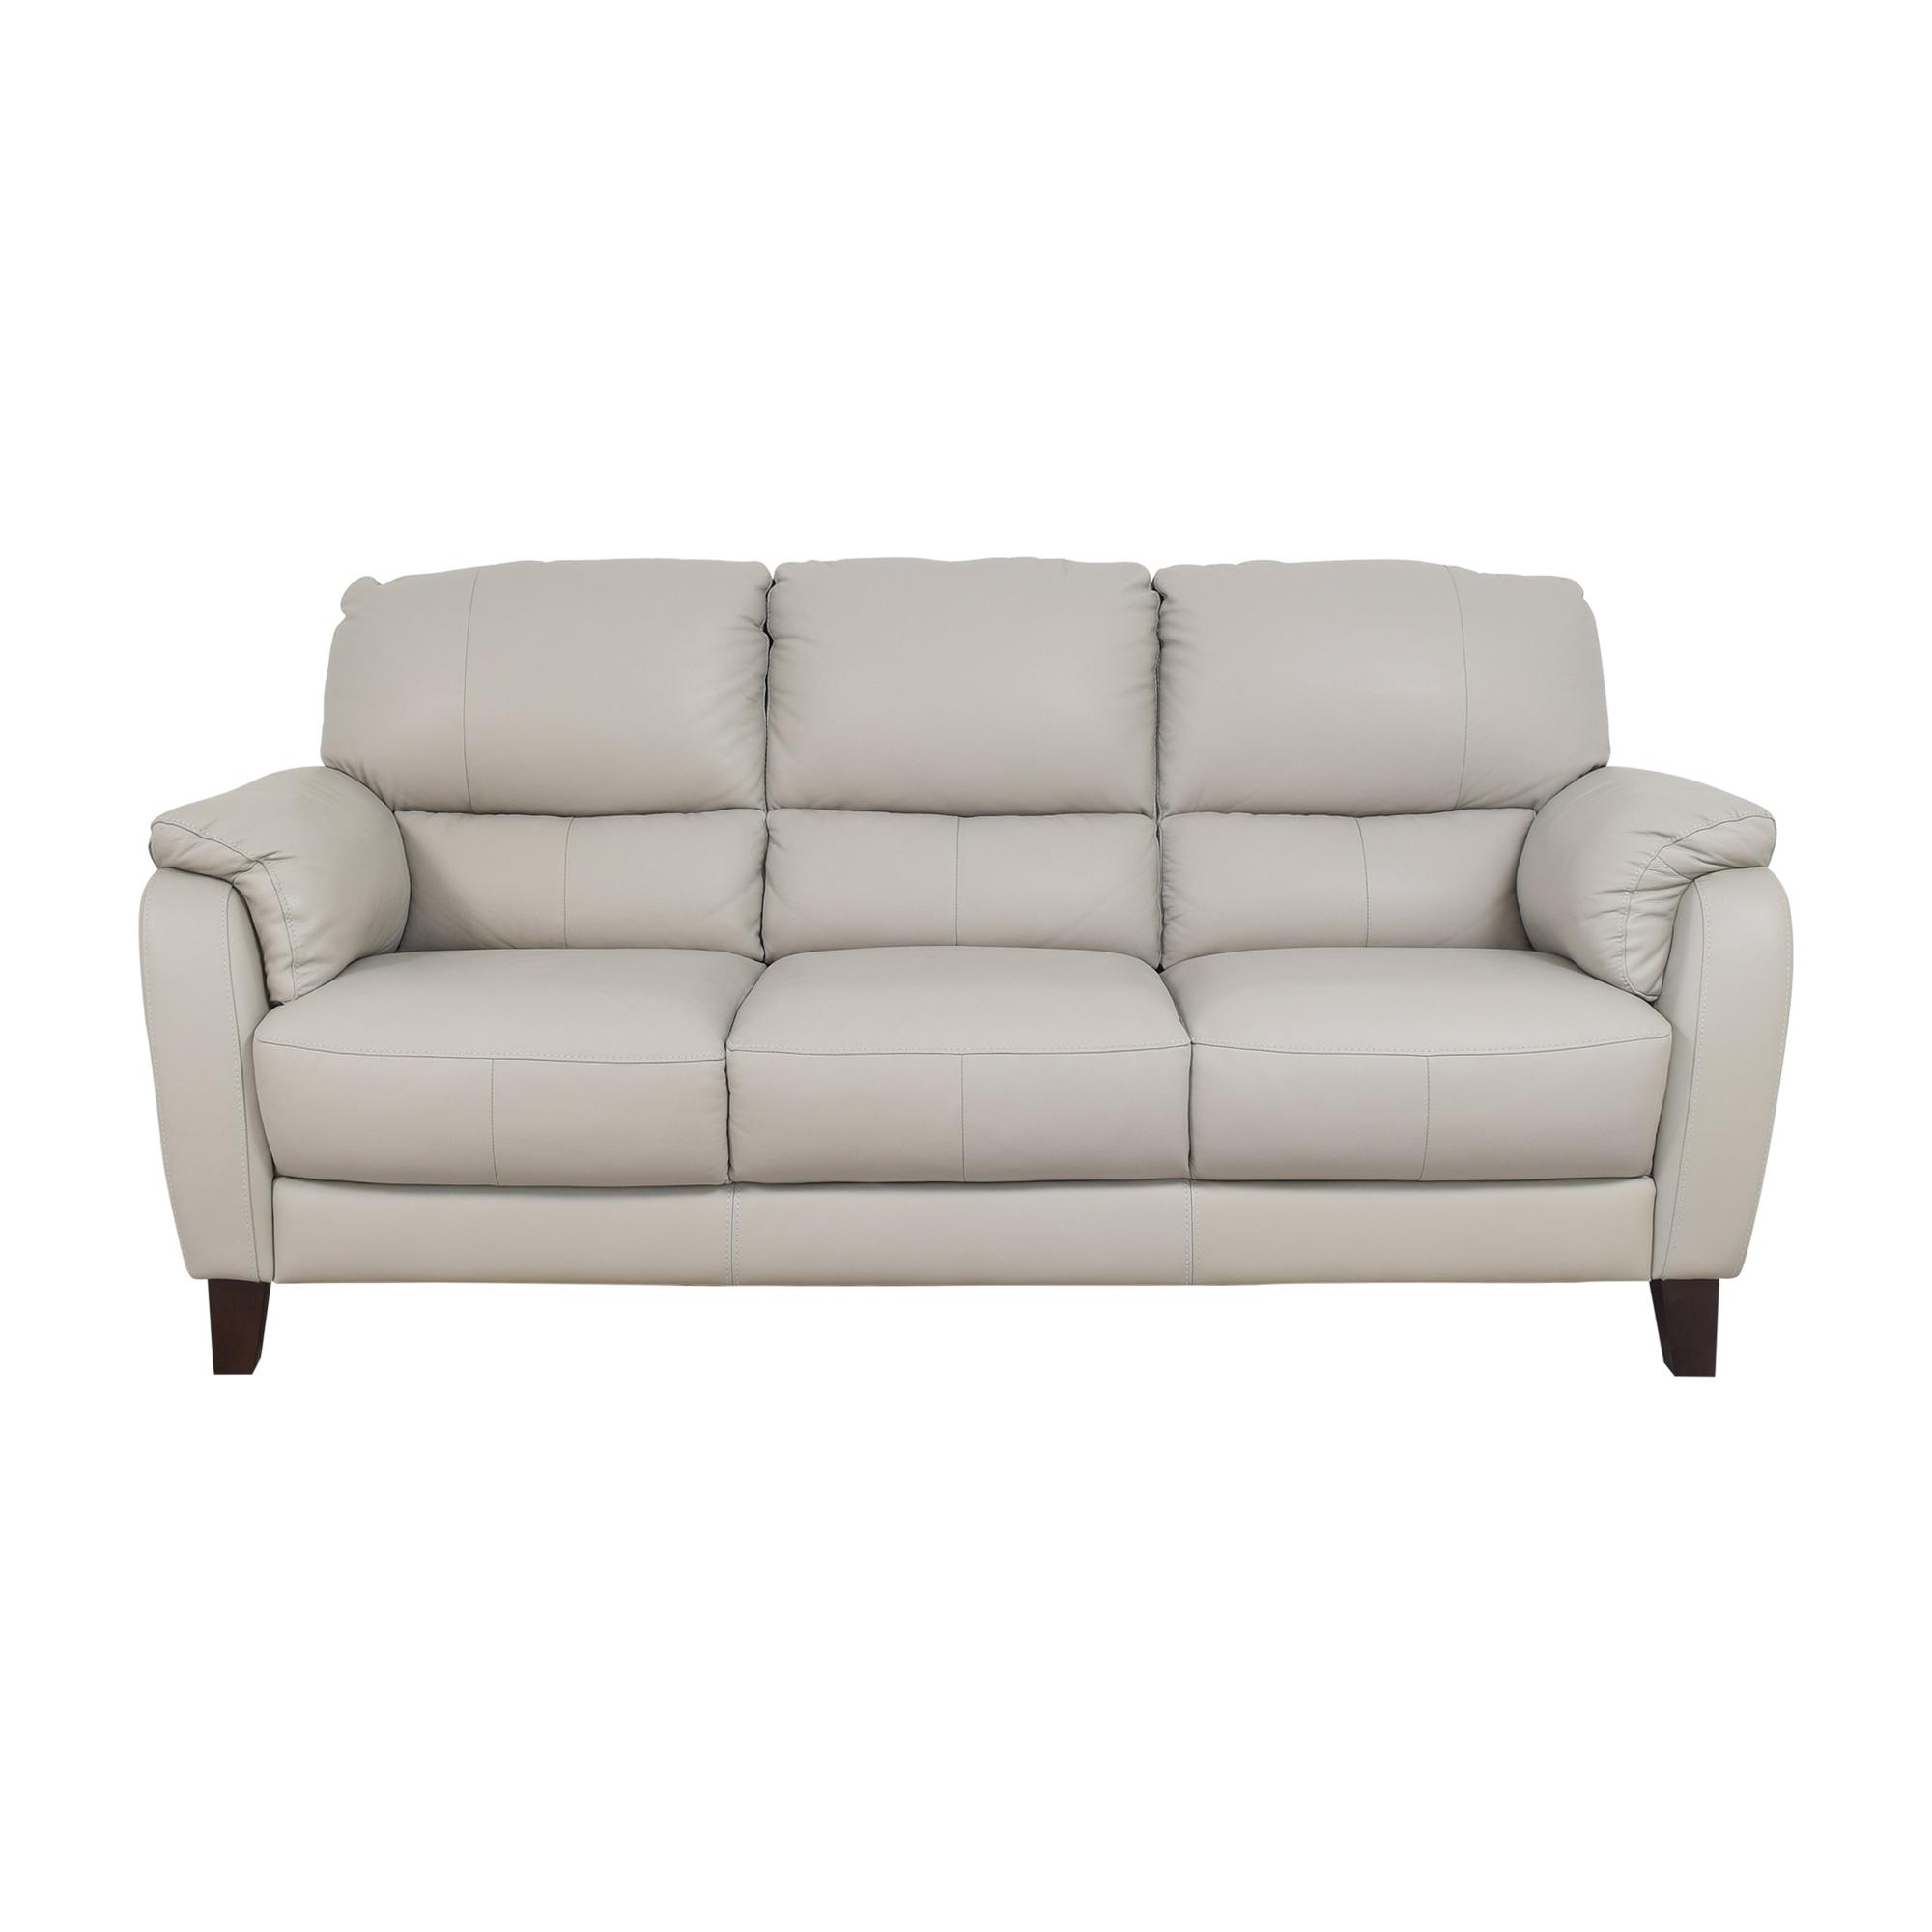 Raymour & Flanigan Harmony Sofa sale